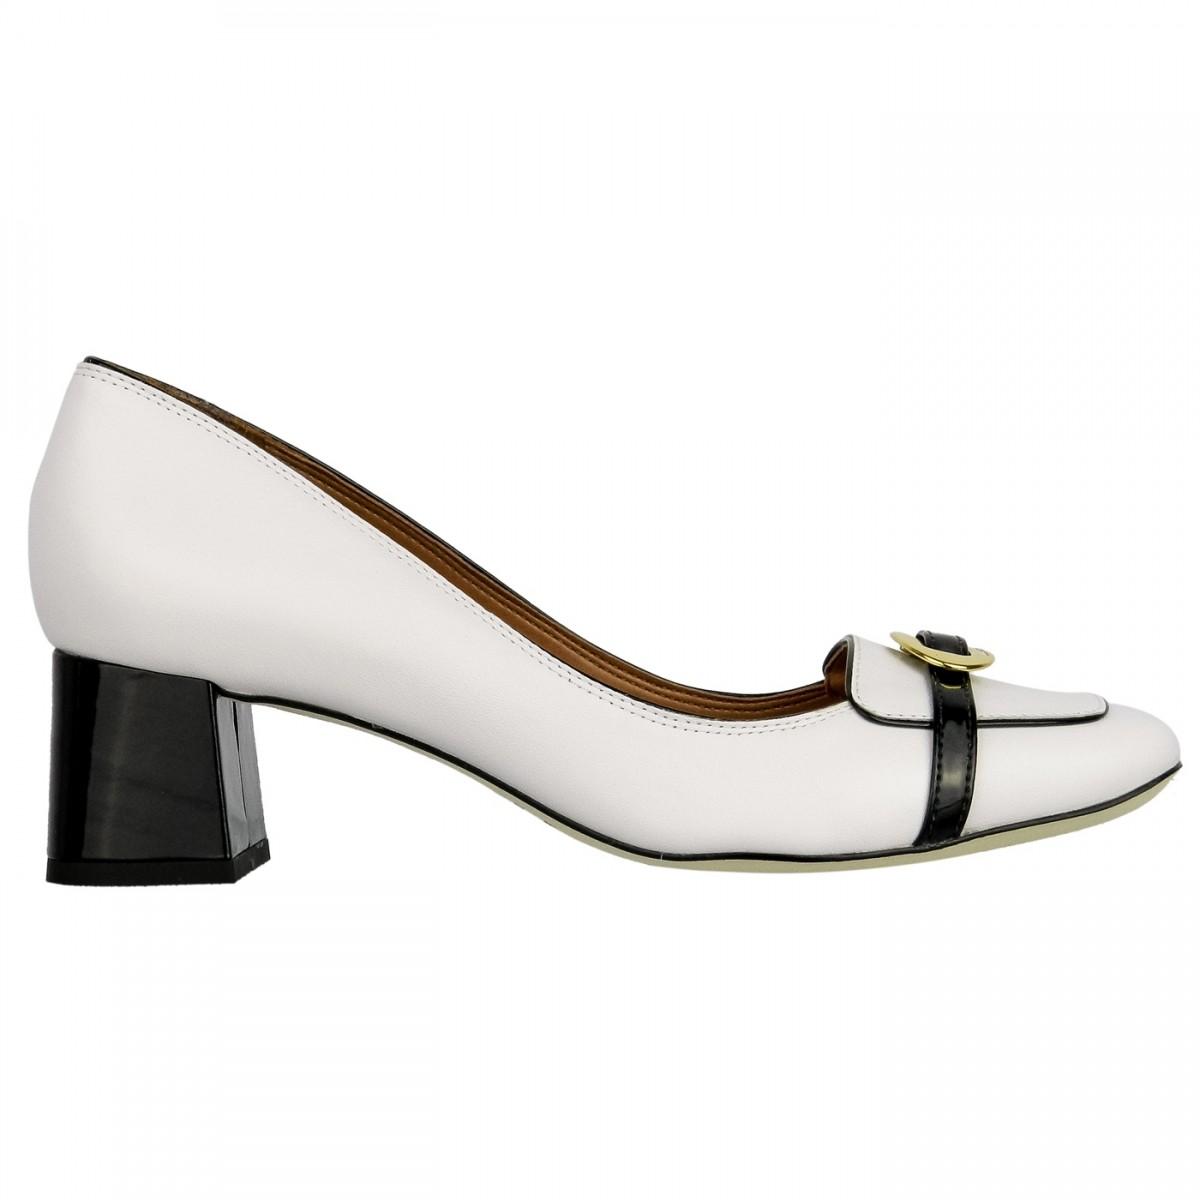 7c2aa532d2 Bizz Store - Sapato Feminino Luz da Lua Saara Couro Legítimo Branco